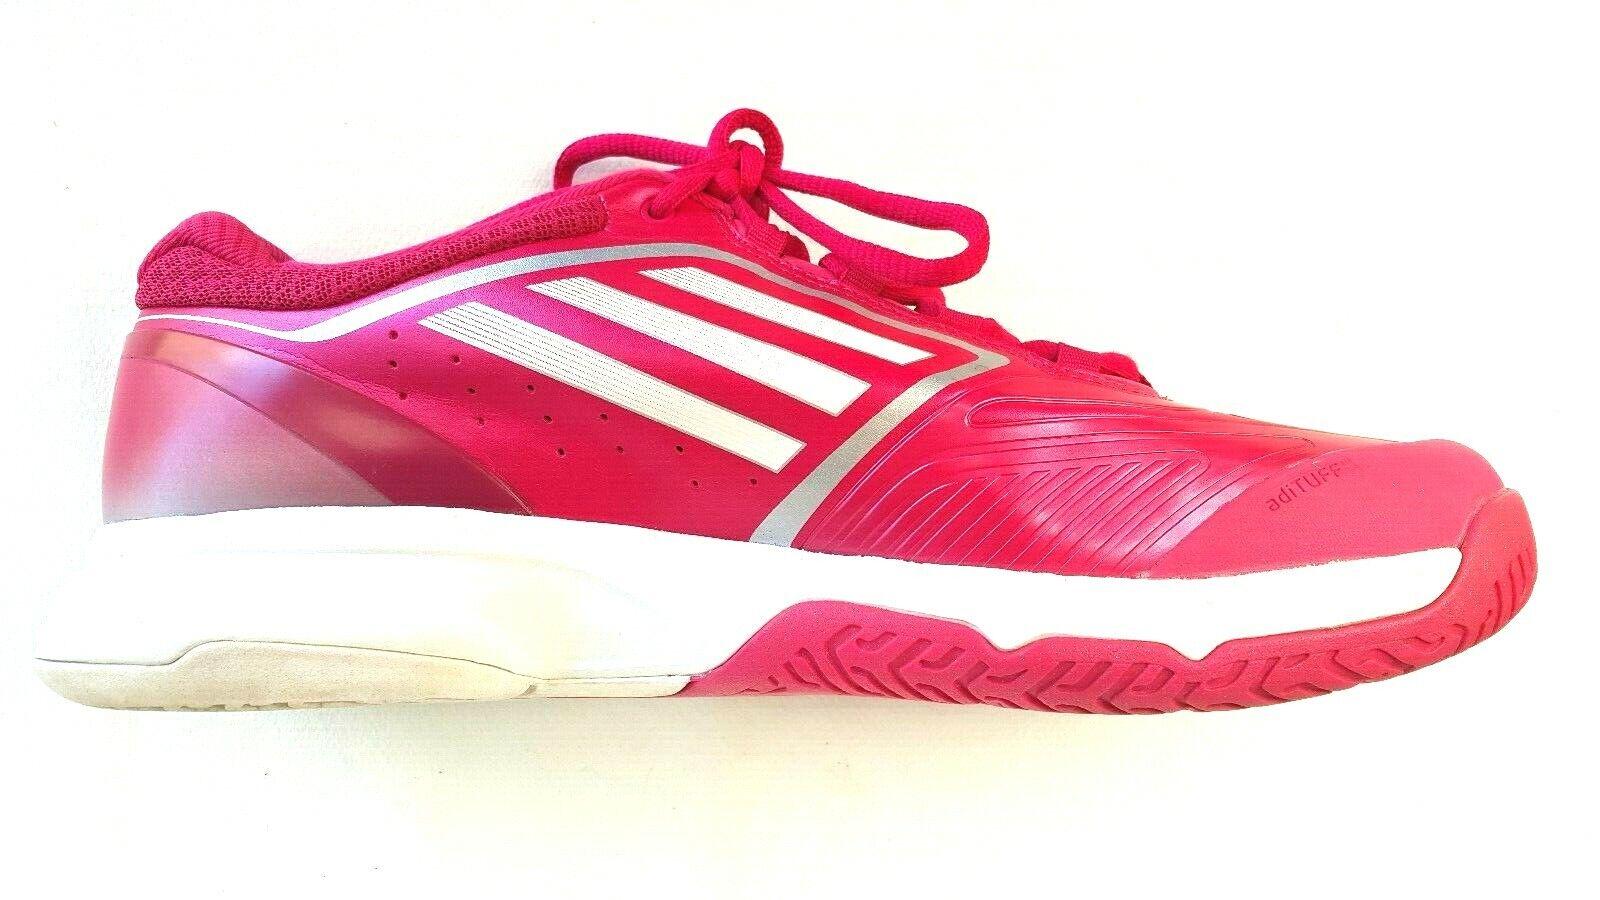 Adidas Adizero Tempaia 11 Sprintweb Womens Rubber Sole Tennis shoes Pink US 11